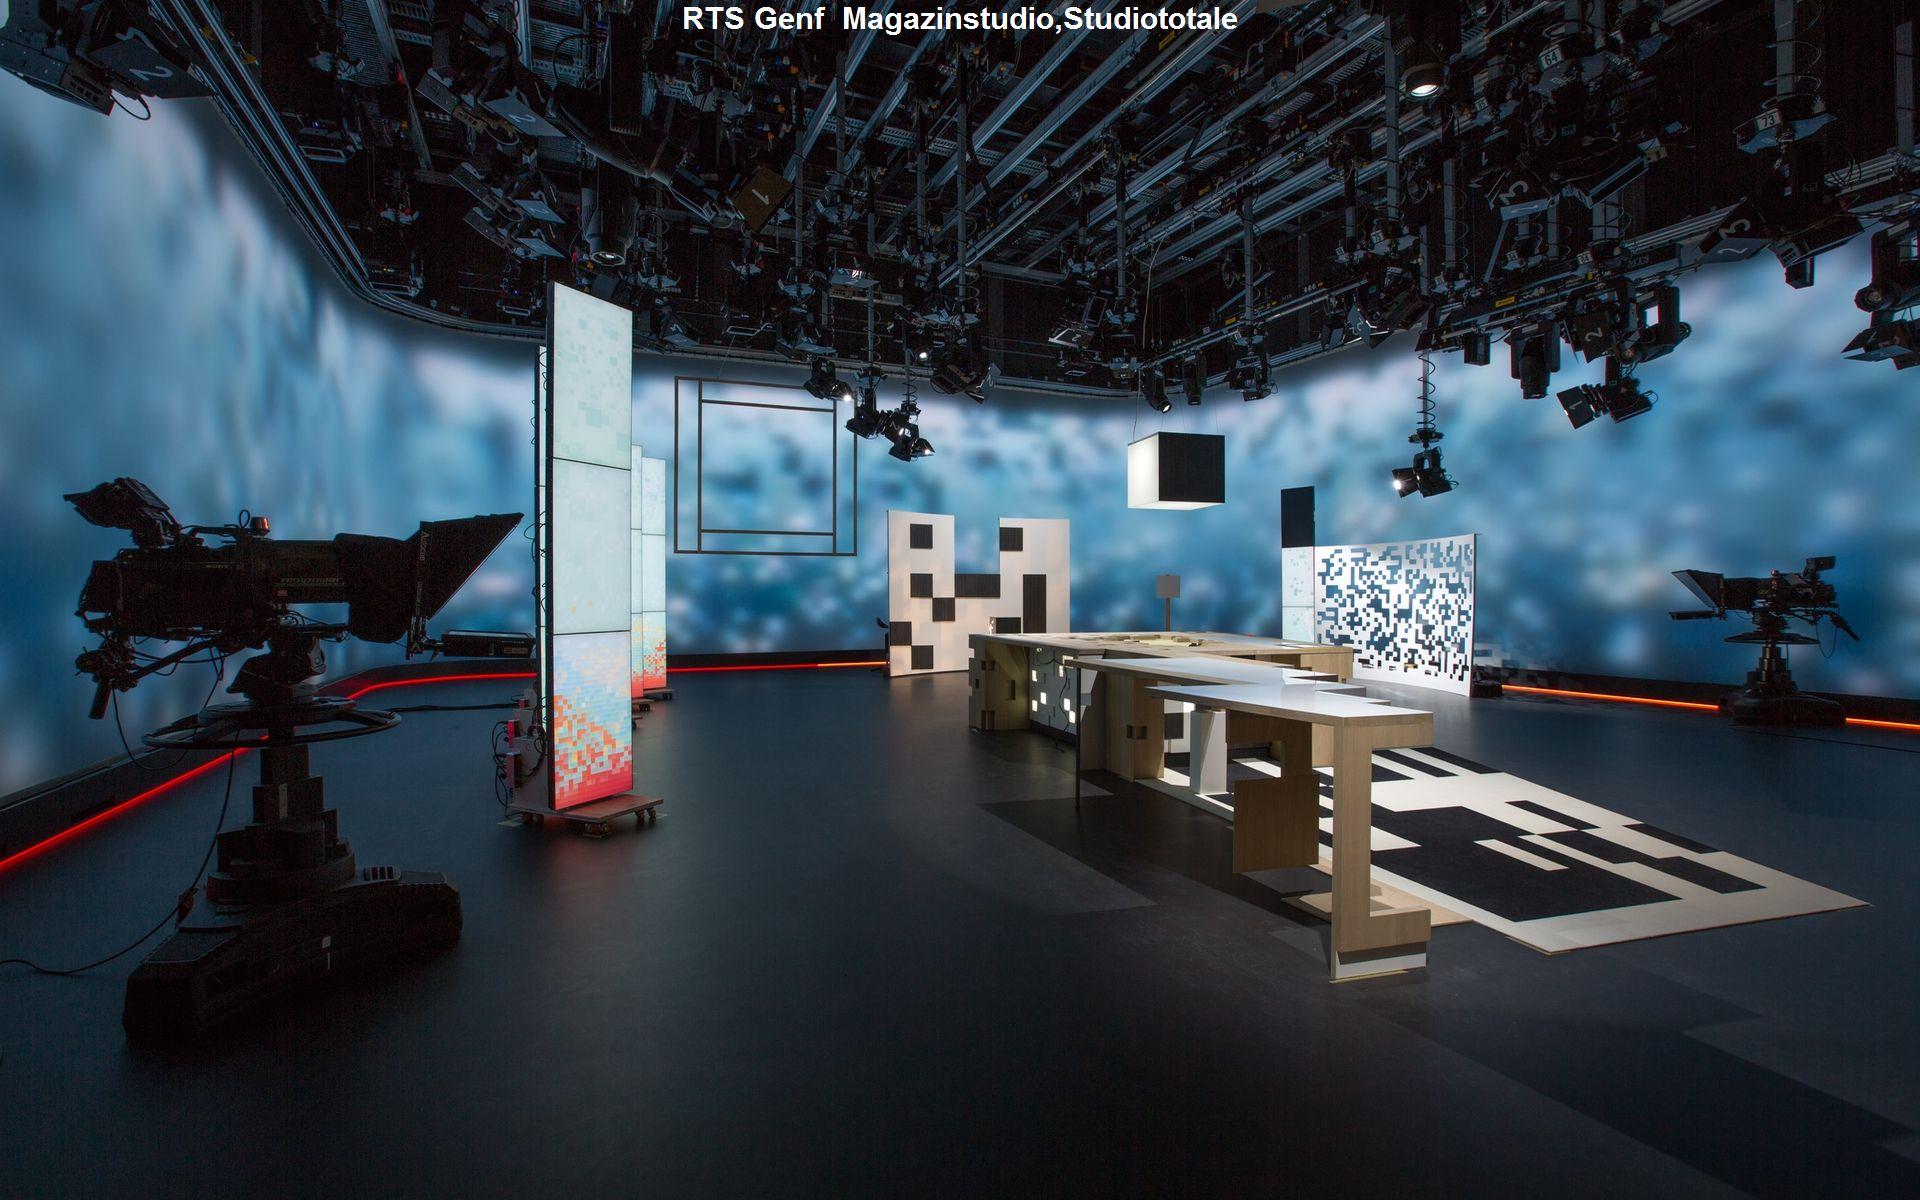 RTS Genf